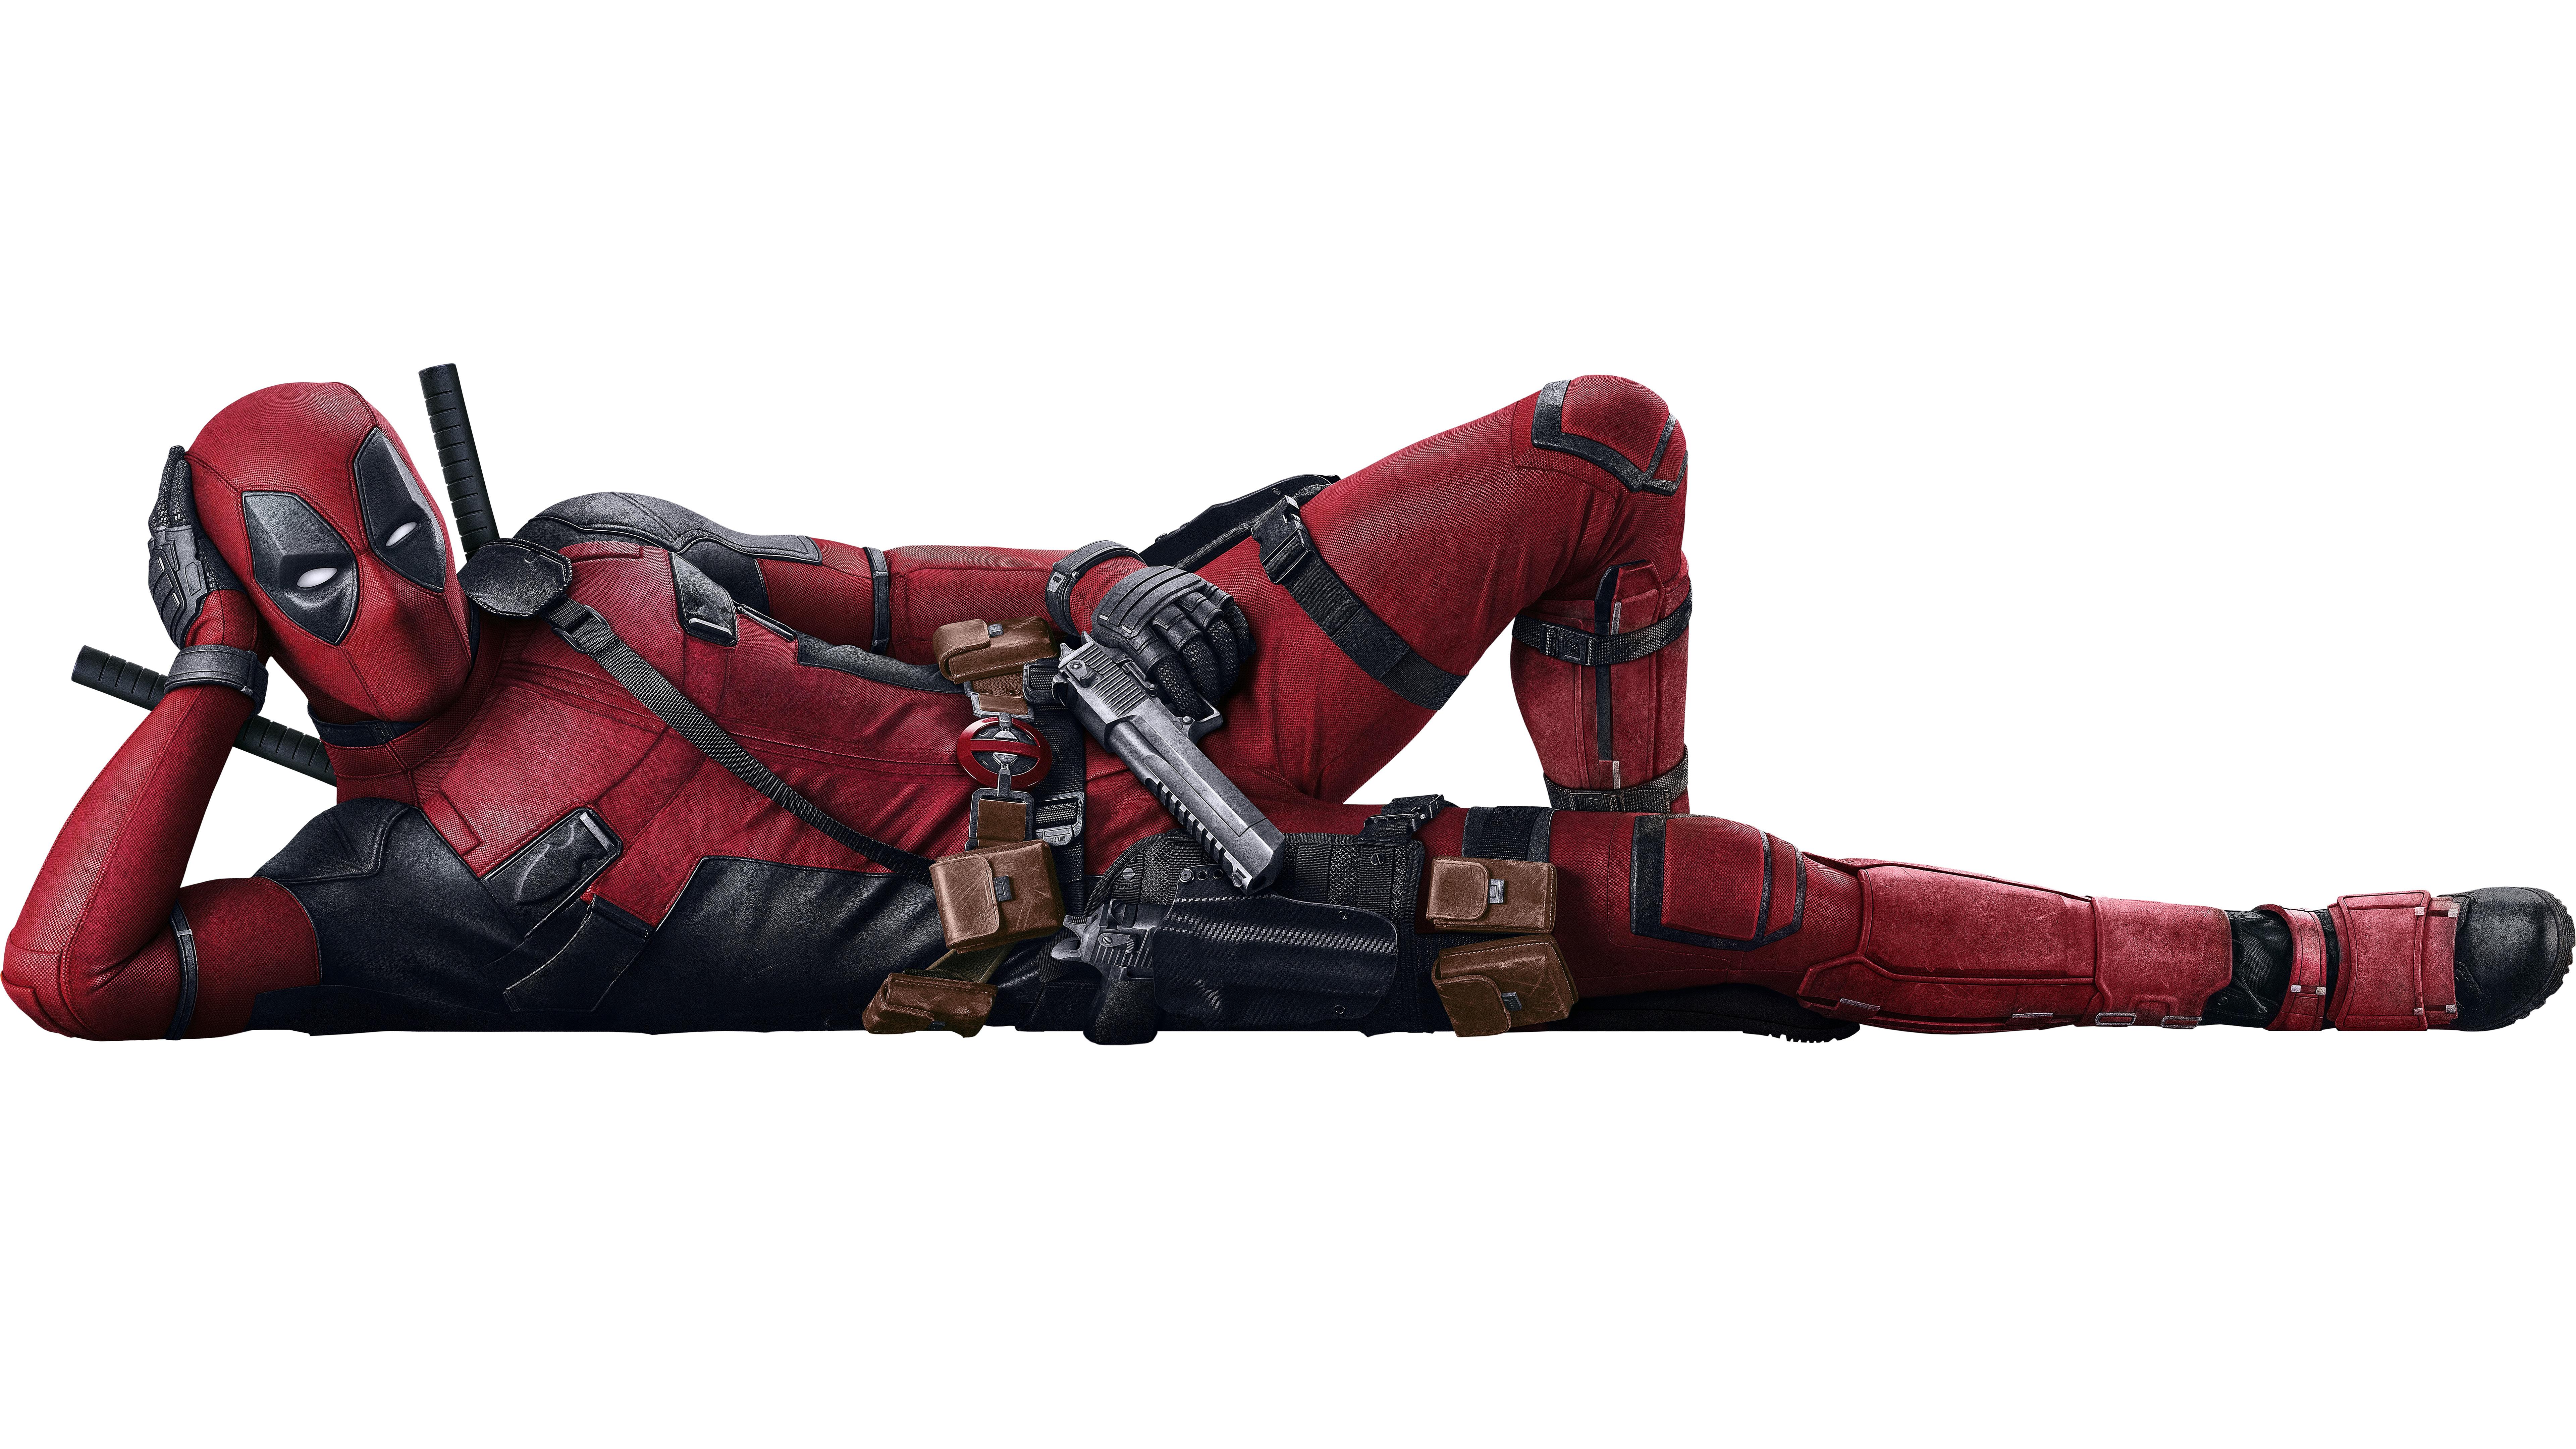 Deadpool 2 Movie 2018 8K, HD Movies, 4k Wallpapers, Images